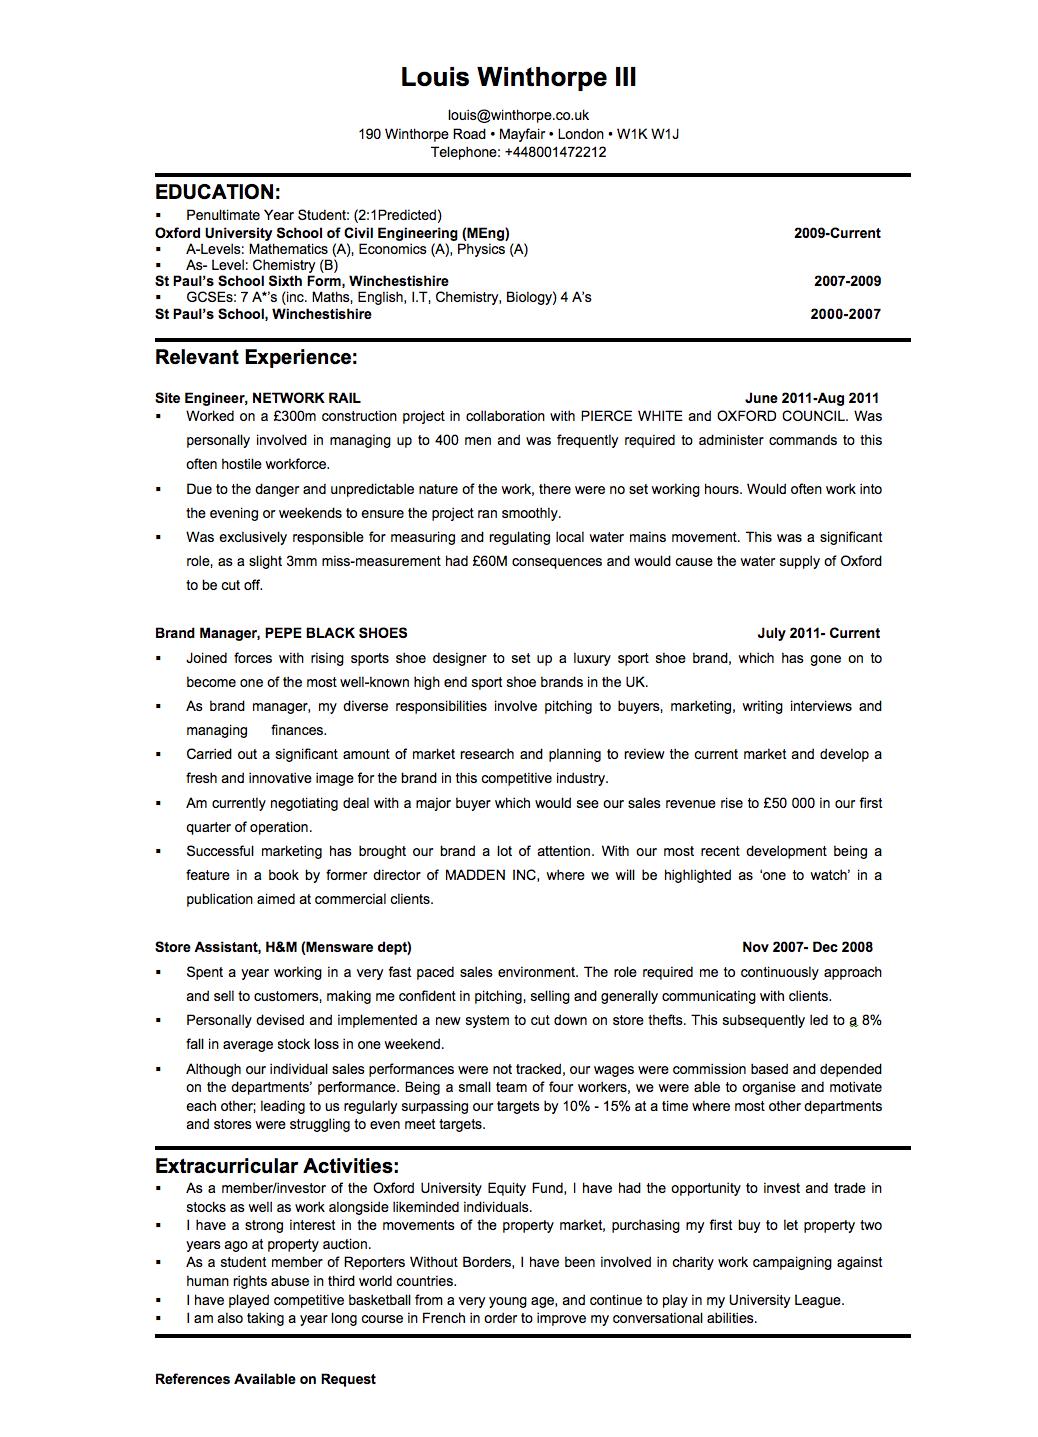 Hedge Fund Resume | 15665 Sle Accounting Resume New Sle Accounting ...